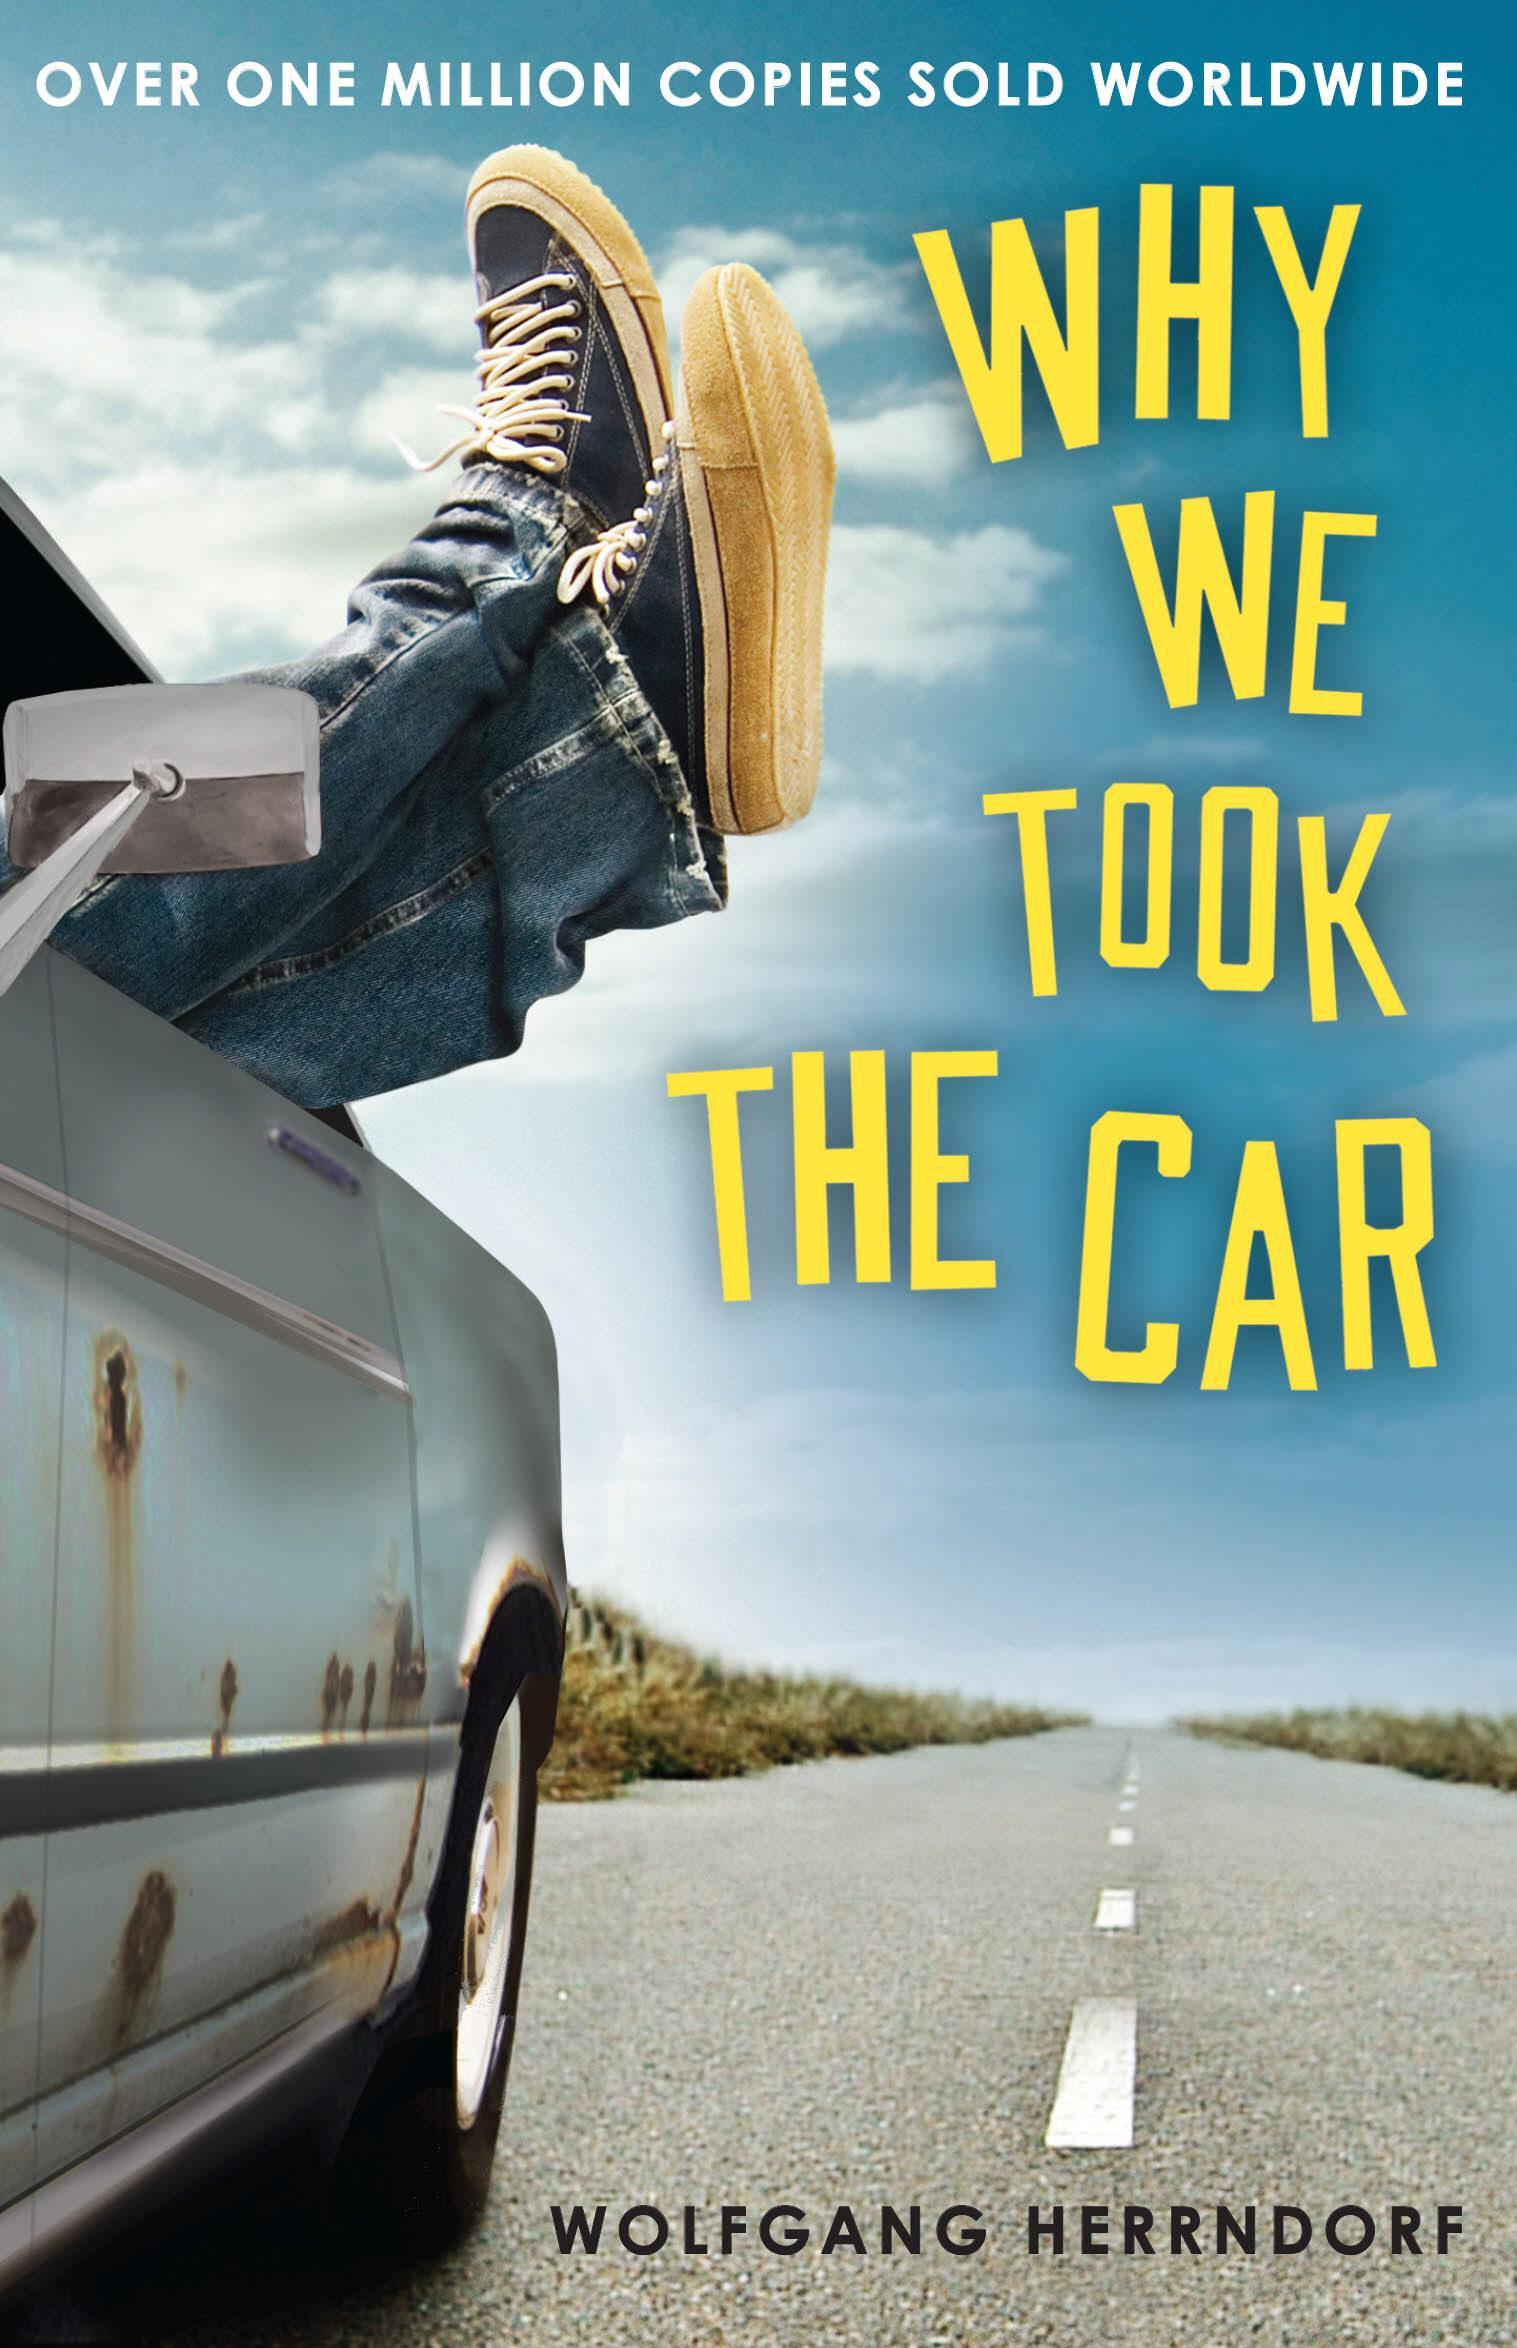 Why We Took the Car , by Wolfgang Herrndorf